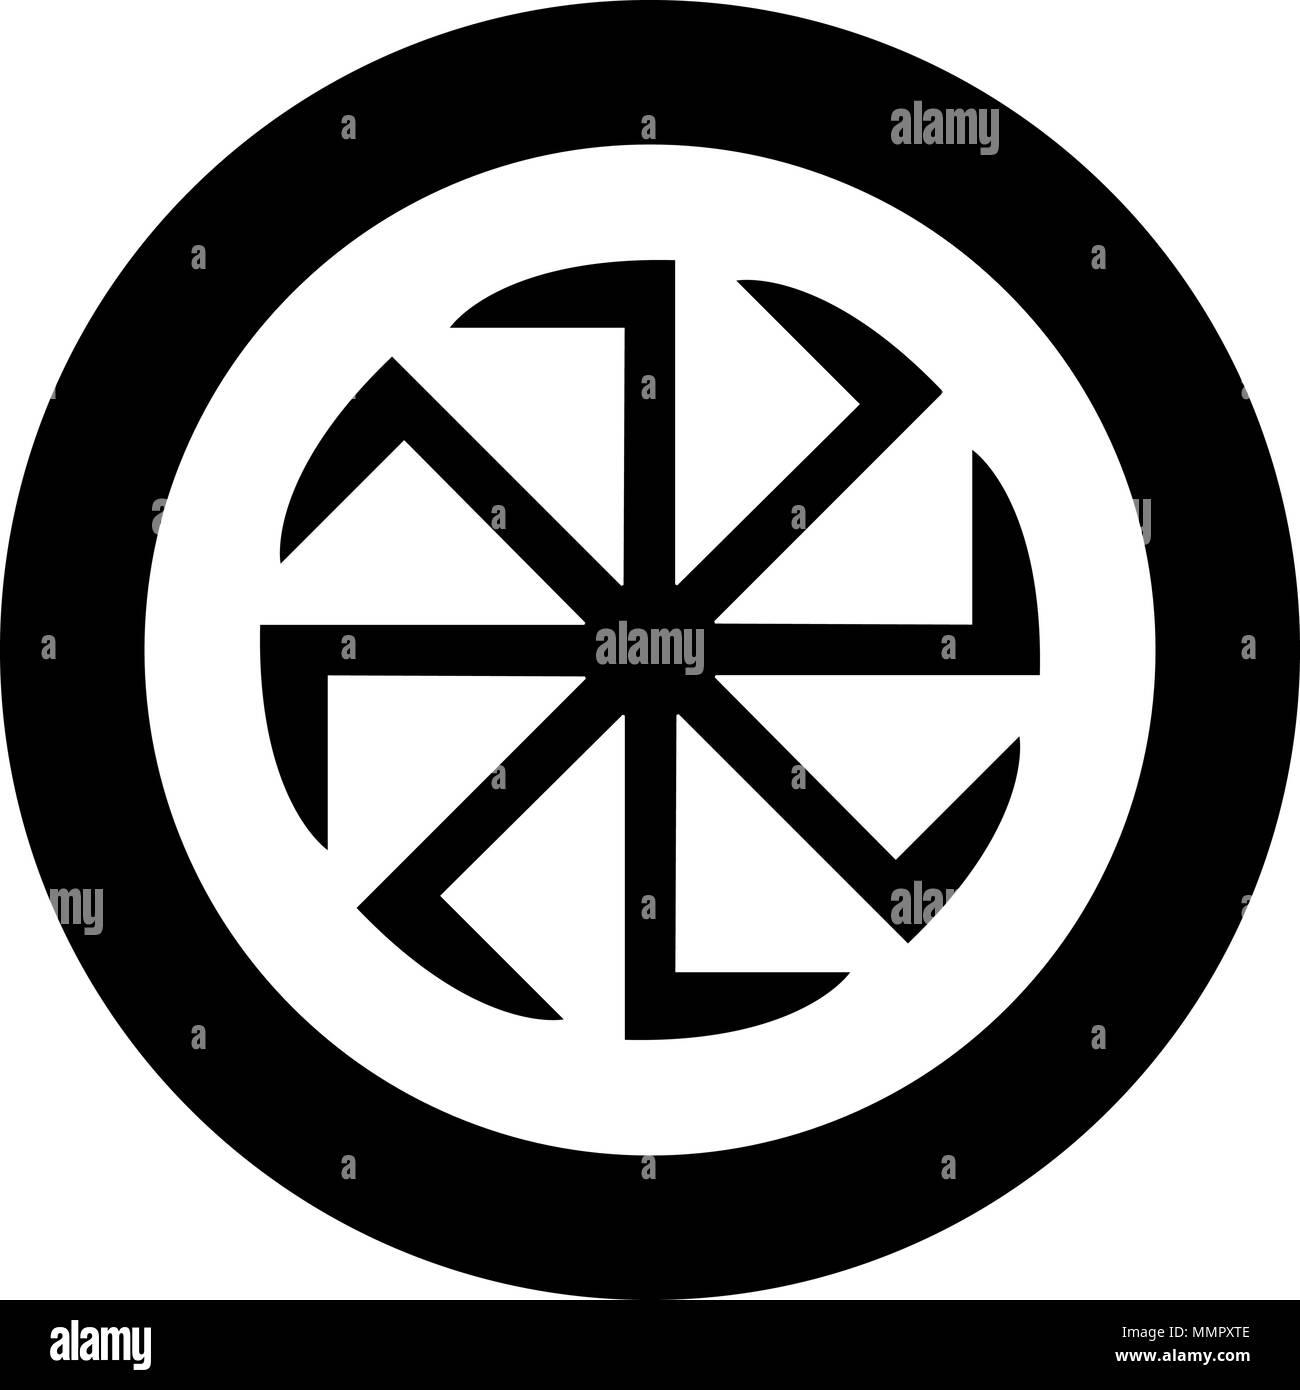 Slavic slavonis symbol Kolovrat sign sun icon black color vector illustration simple image flat style - Stock Image